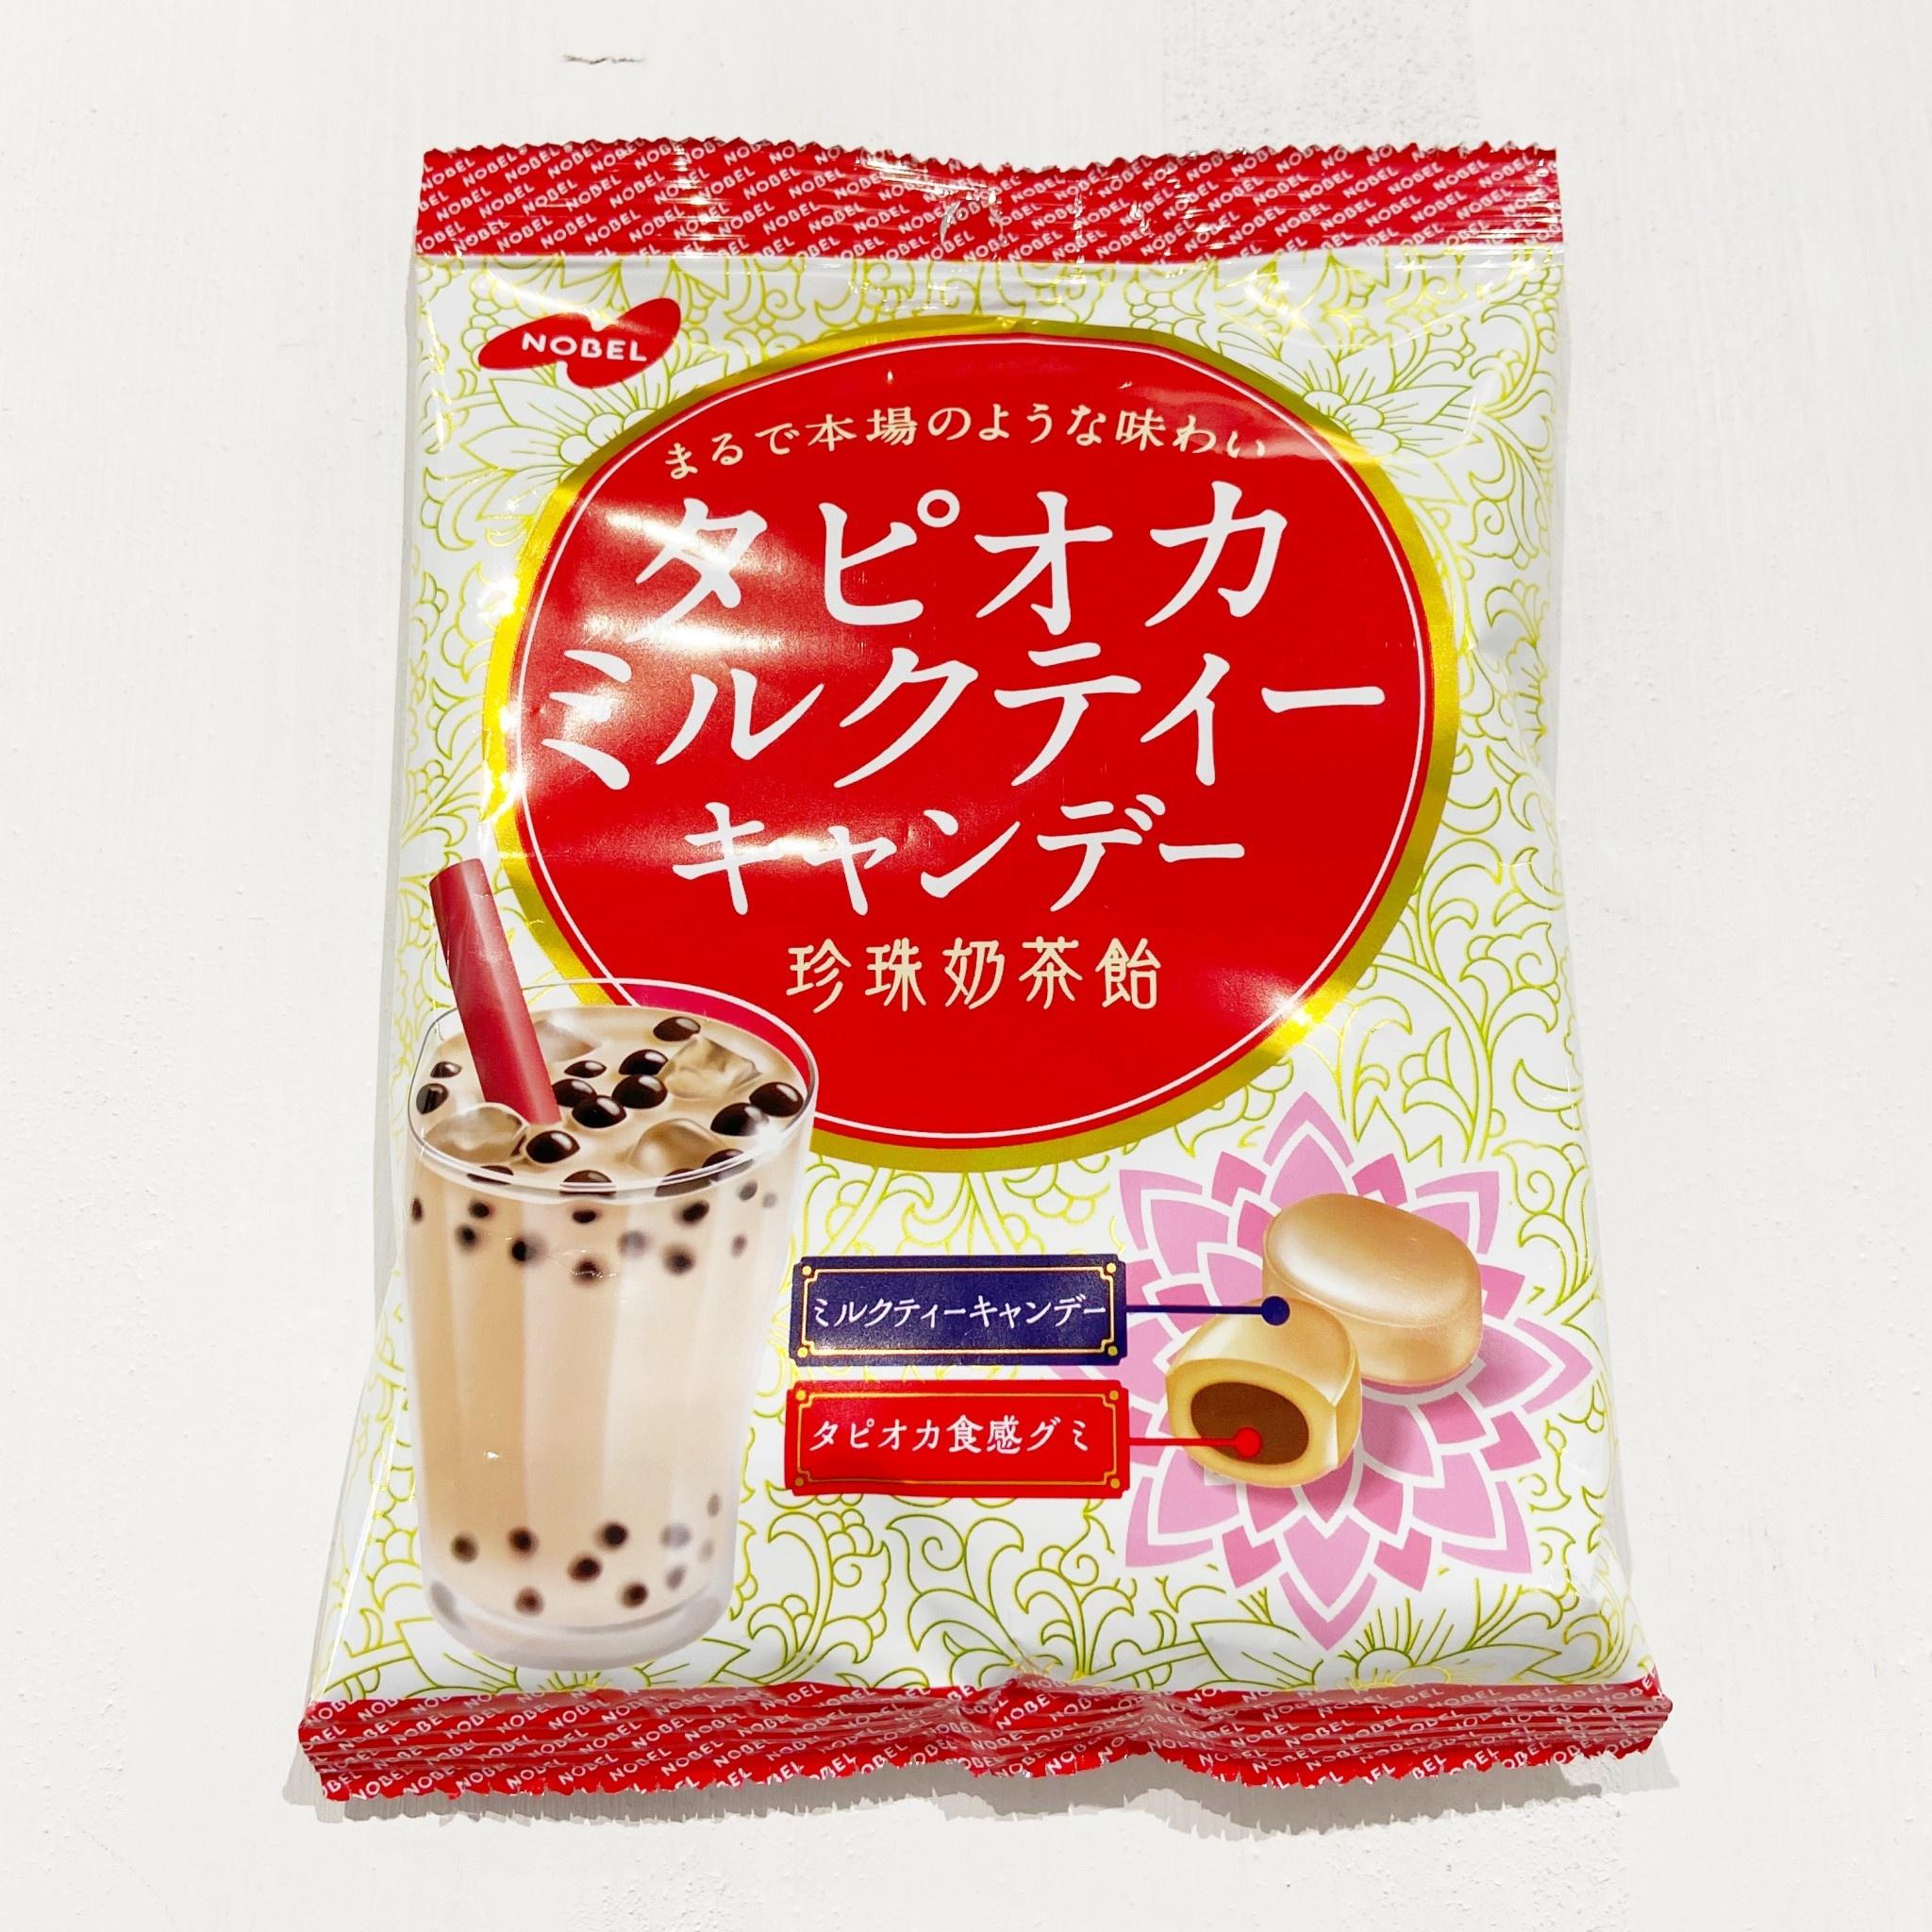 NOBEL Bubble Tea Candy